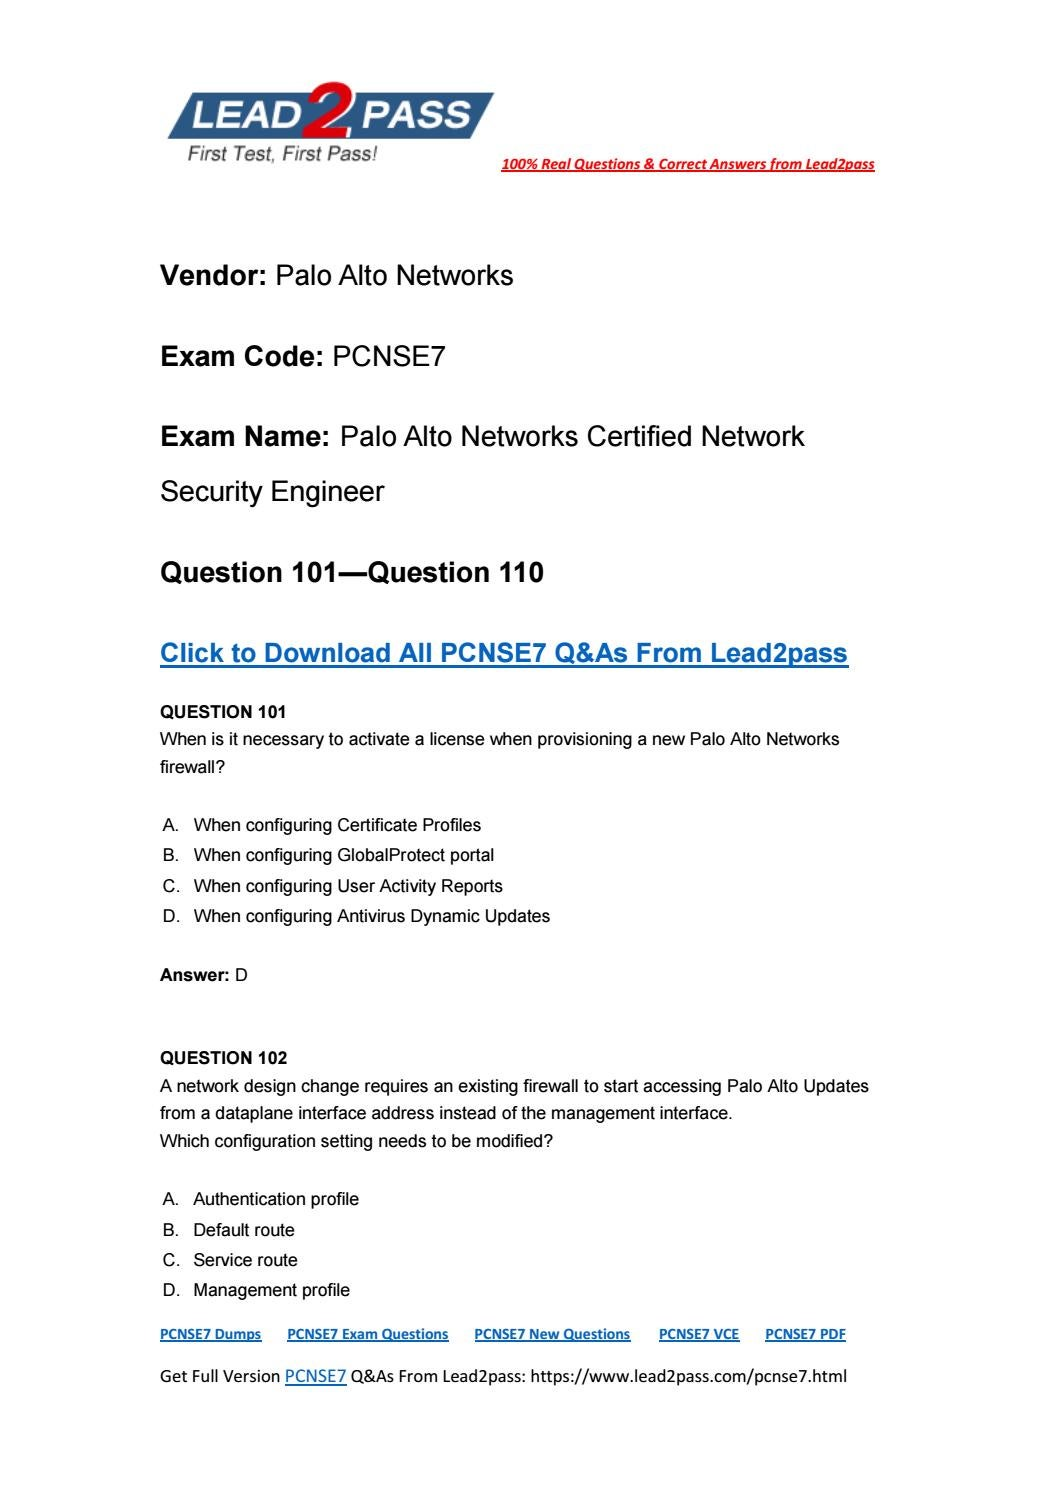 Lead2pass New PCNSE7 Exam PDF Ensure PCNSE7 Certification Exam Pass 100%  (101-110)